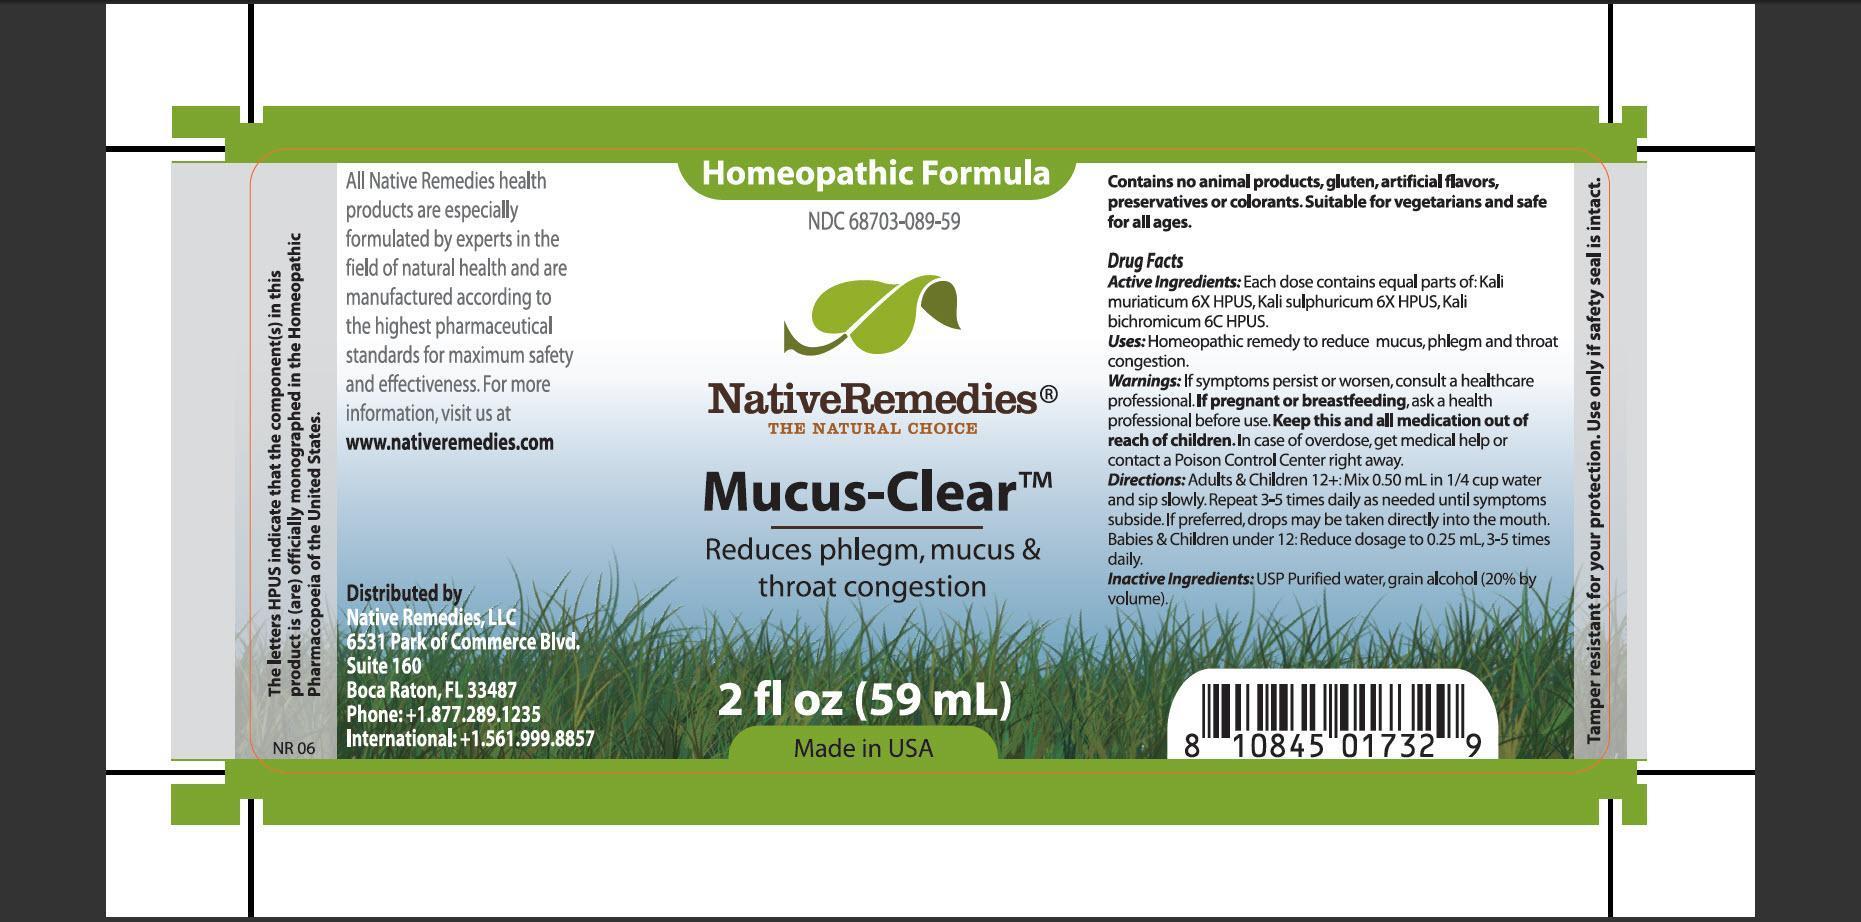 Mucus-clear (Kali Muriaticum, Kali Sulphuricum, Kali Bichromicum) Tincture [Native Remedies, Llc]